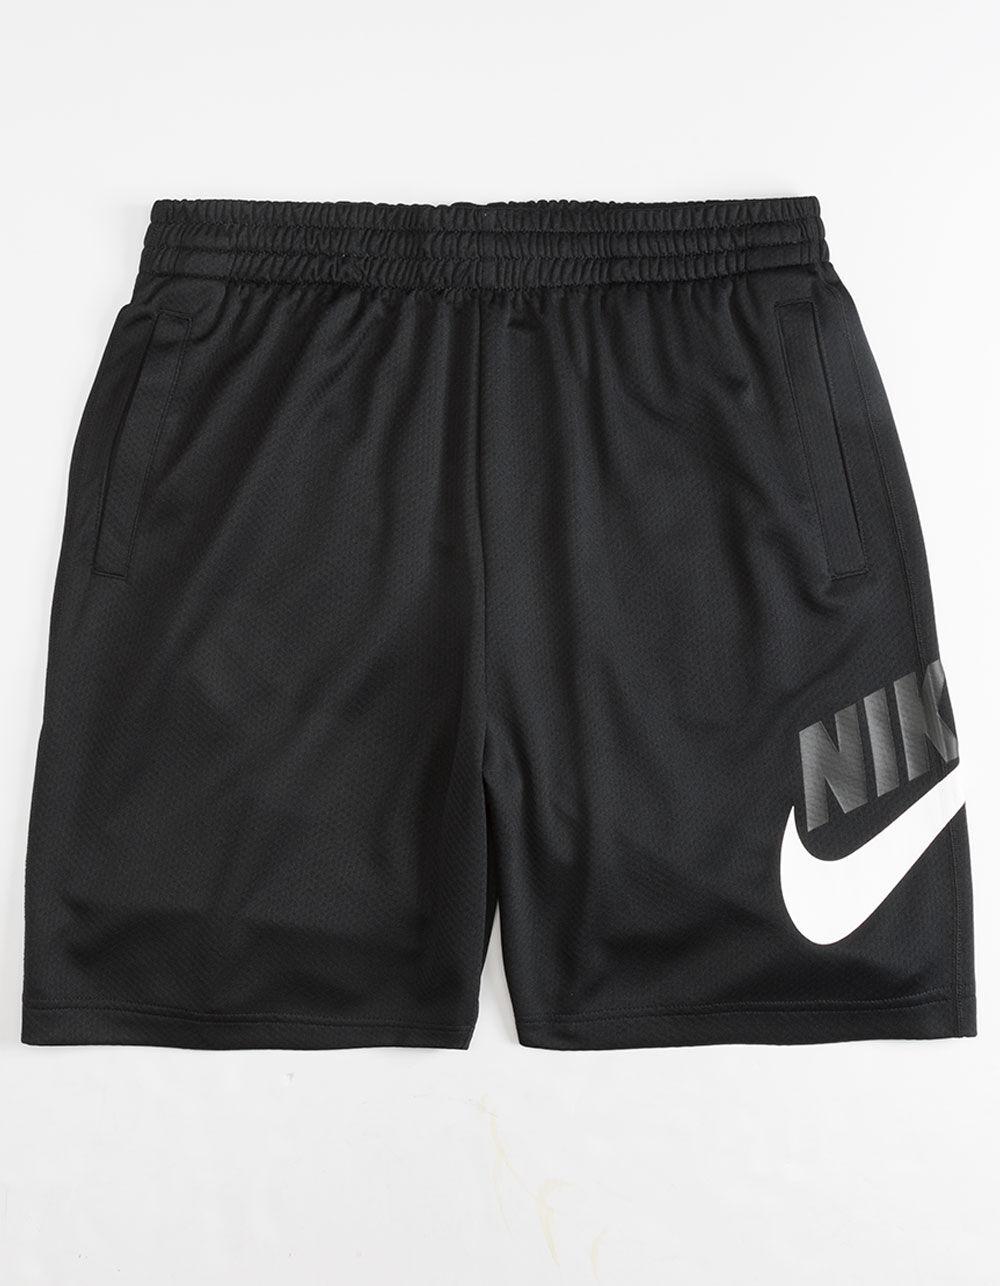 NIKE SB Dri-FIT Sunday Black Shorts